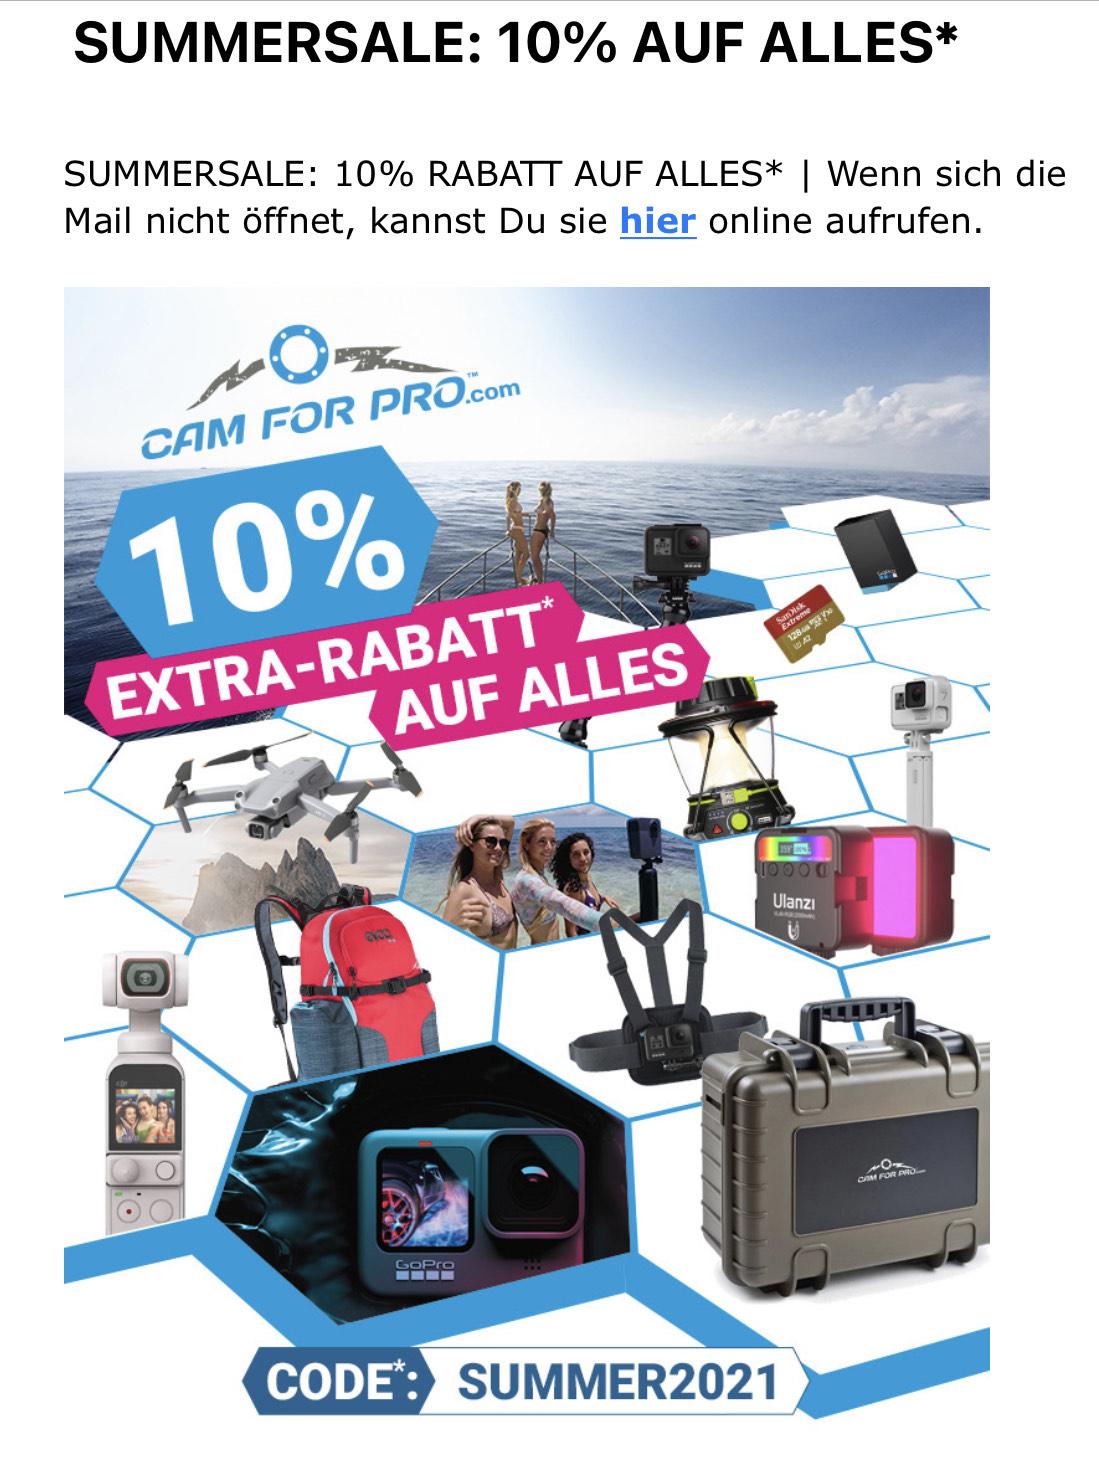 10% Rabatt bei CamForPro (GoPro, DJI,…)